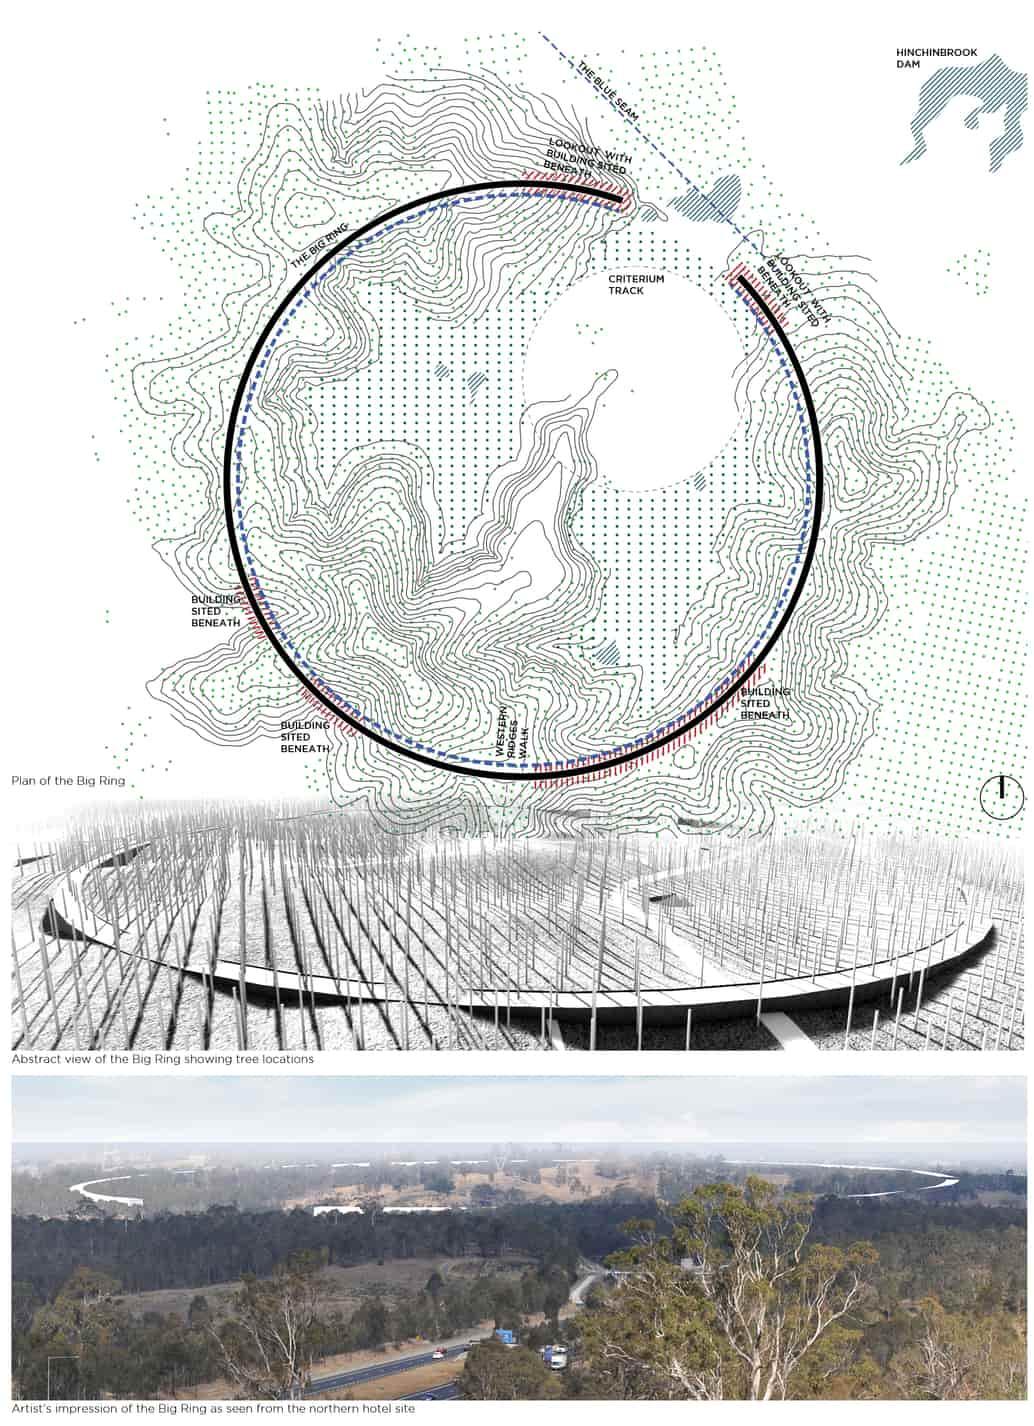 South parklands earth sculpture proposal by TYRELLSTUDIO.